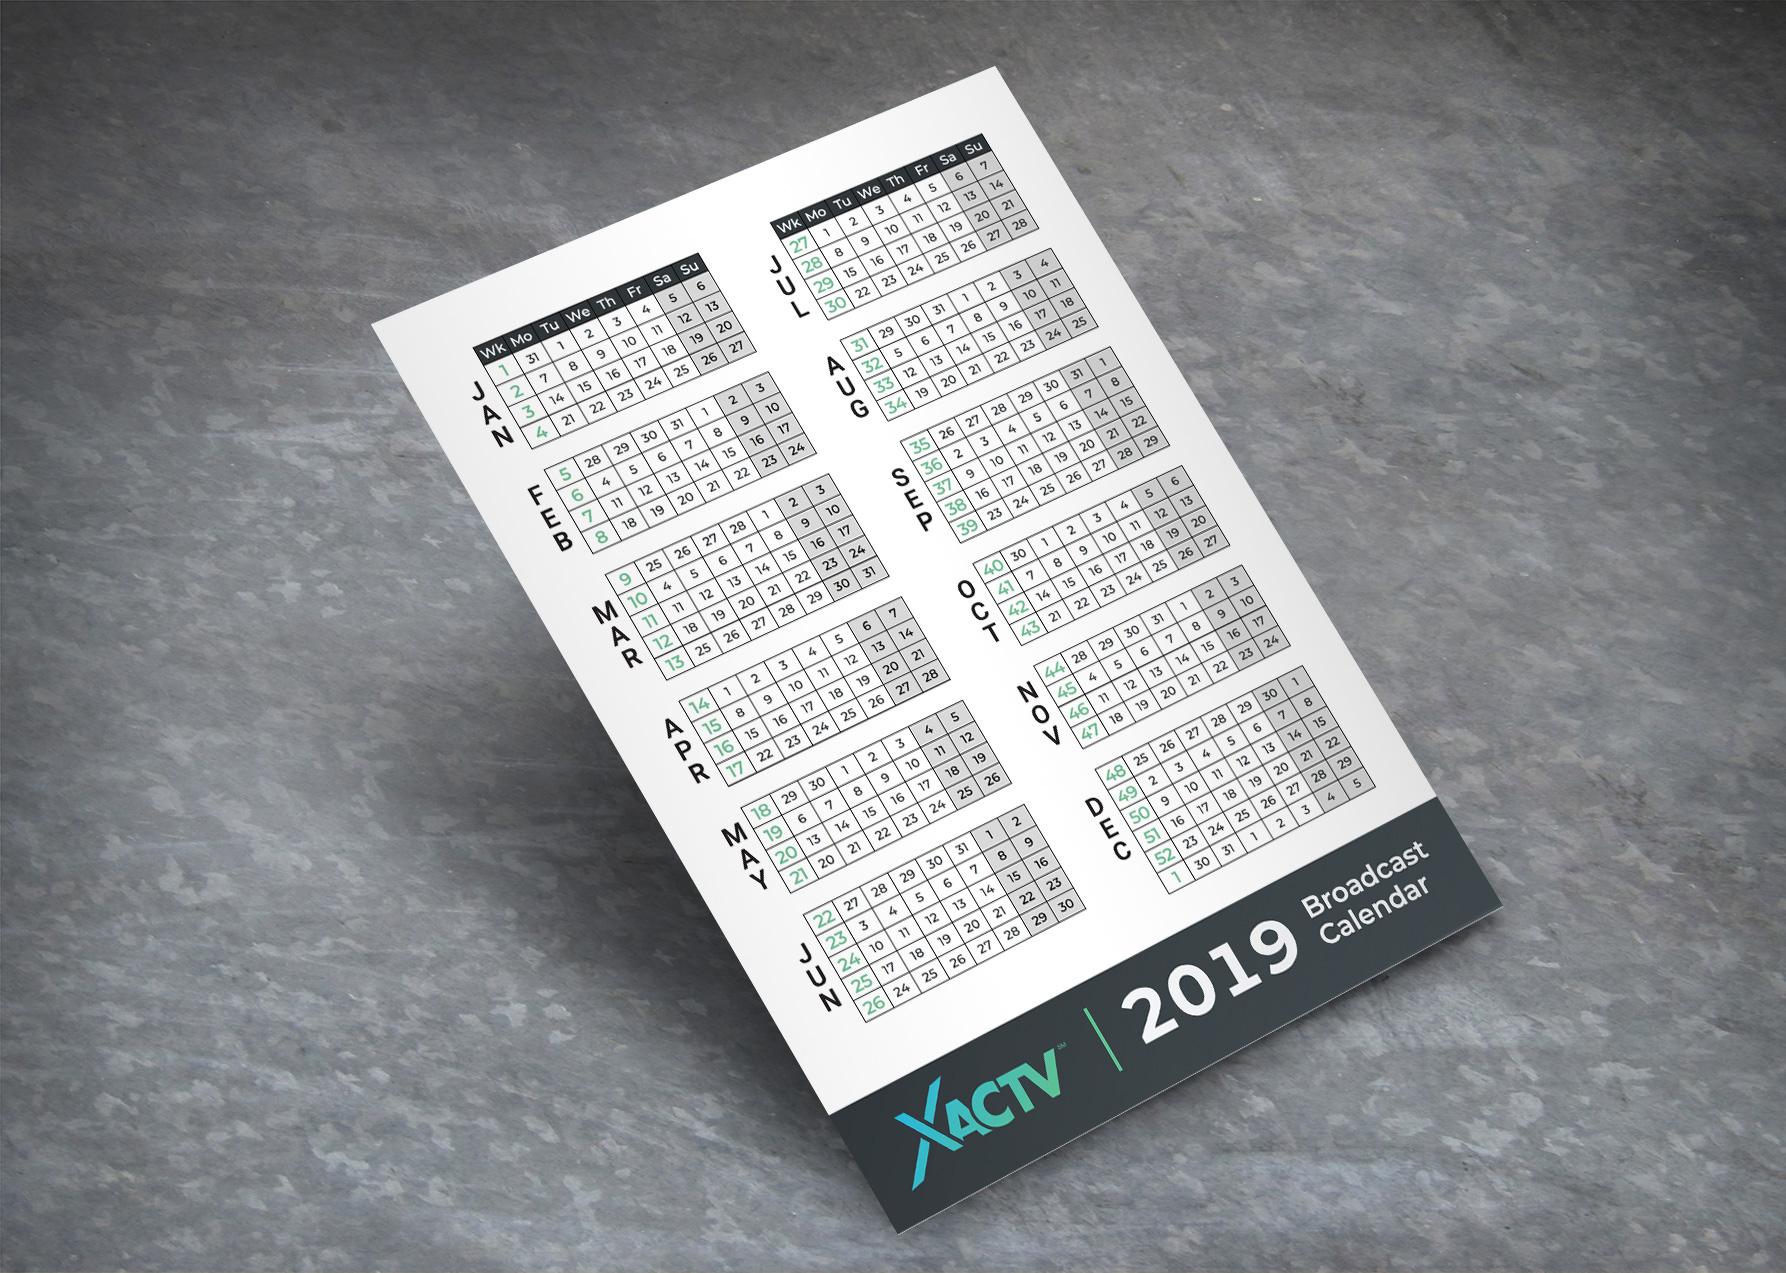 XACTV 2019 Media Calendar